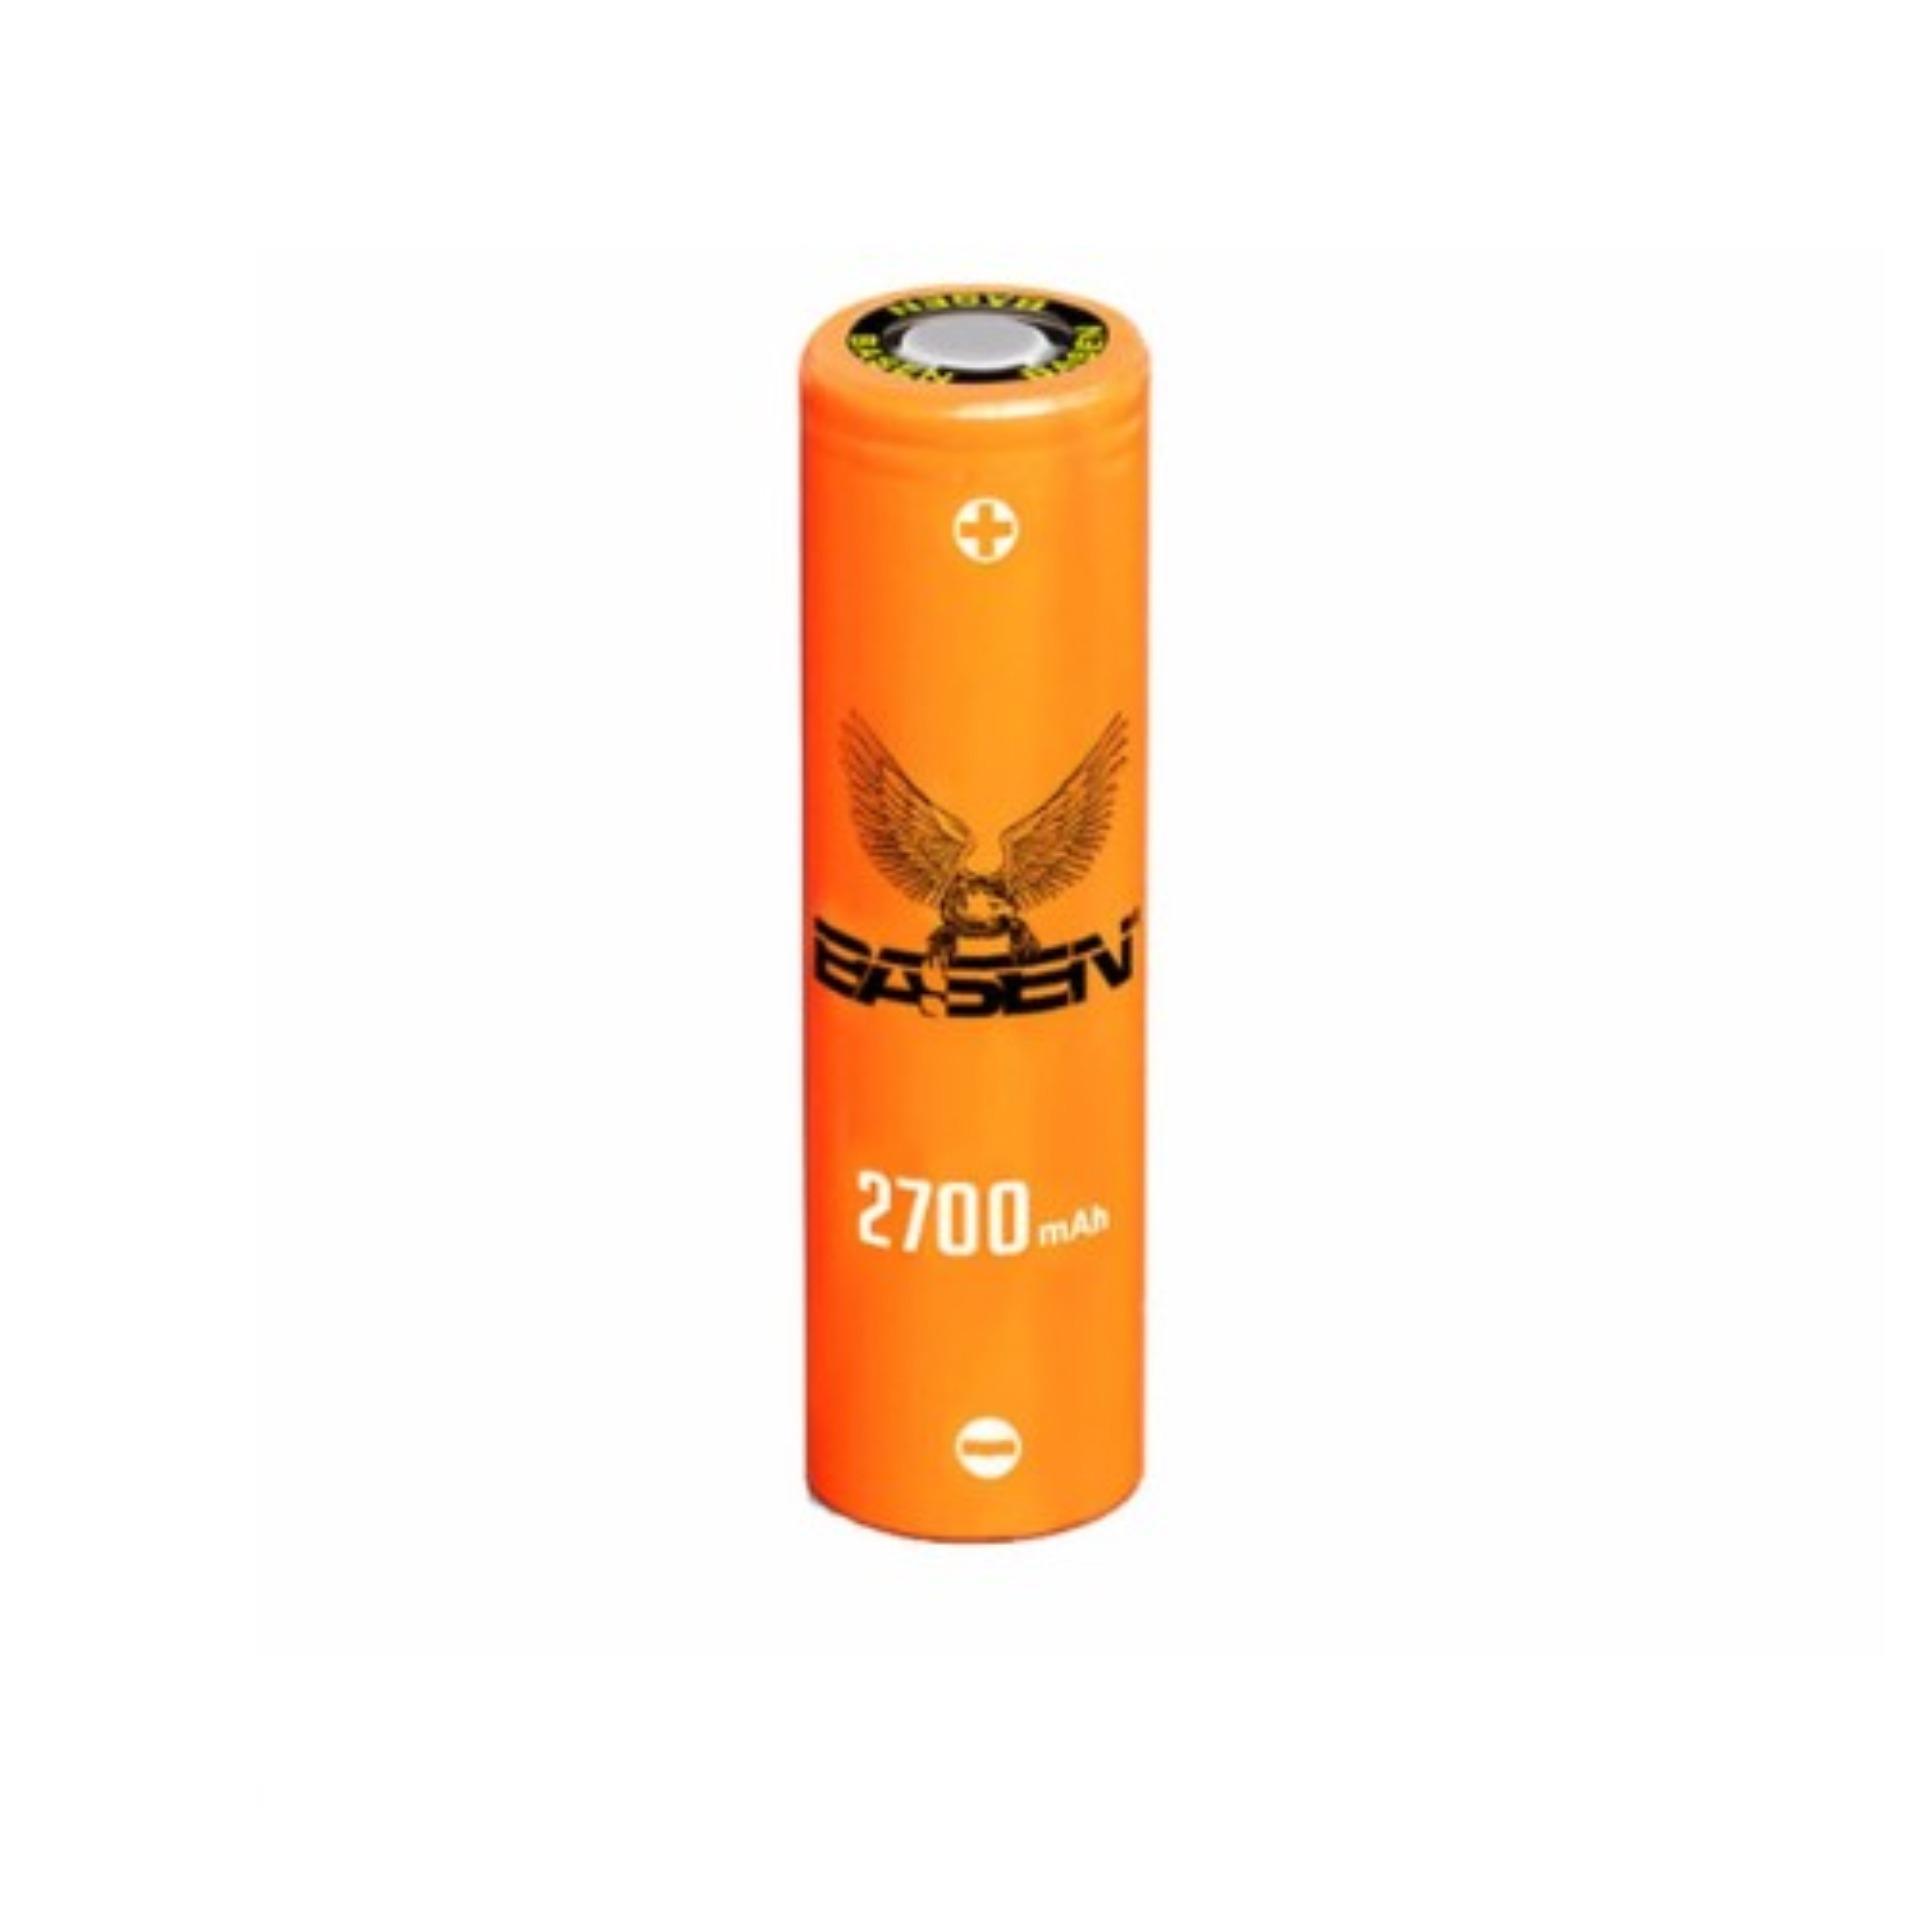 AUTHENTIC BASEN 2700mAh 45A Battery Baterai vapor vape 18650